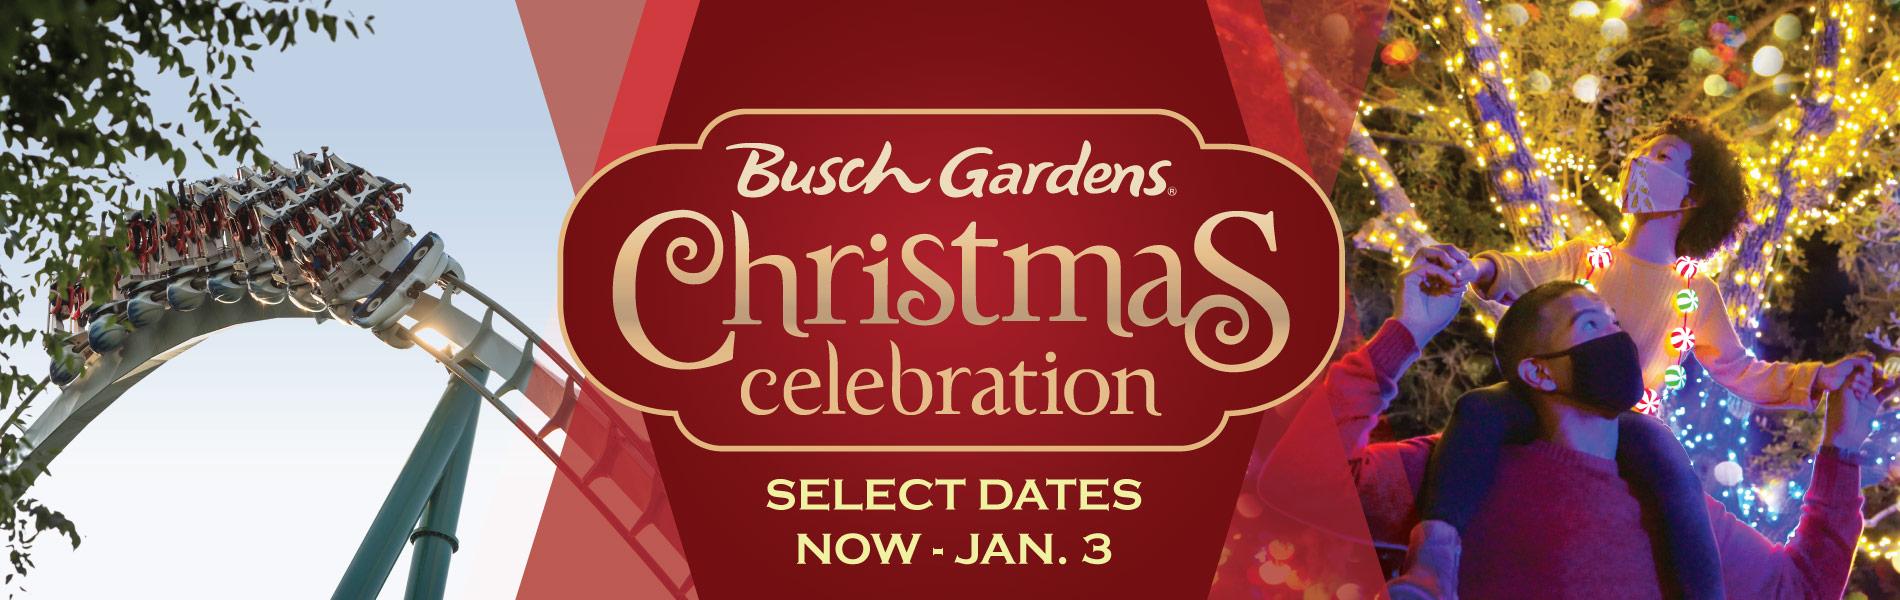 Christmas Celebration   Williamsburg Holiday Event   Busch Gardens Williamsburg